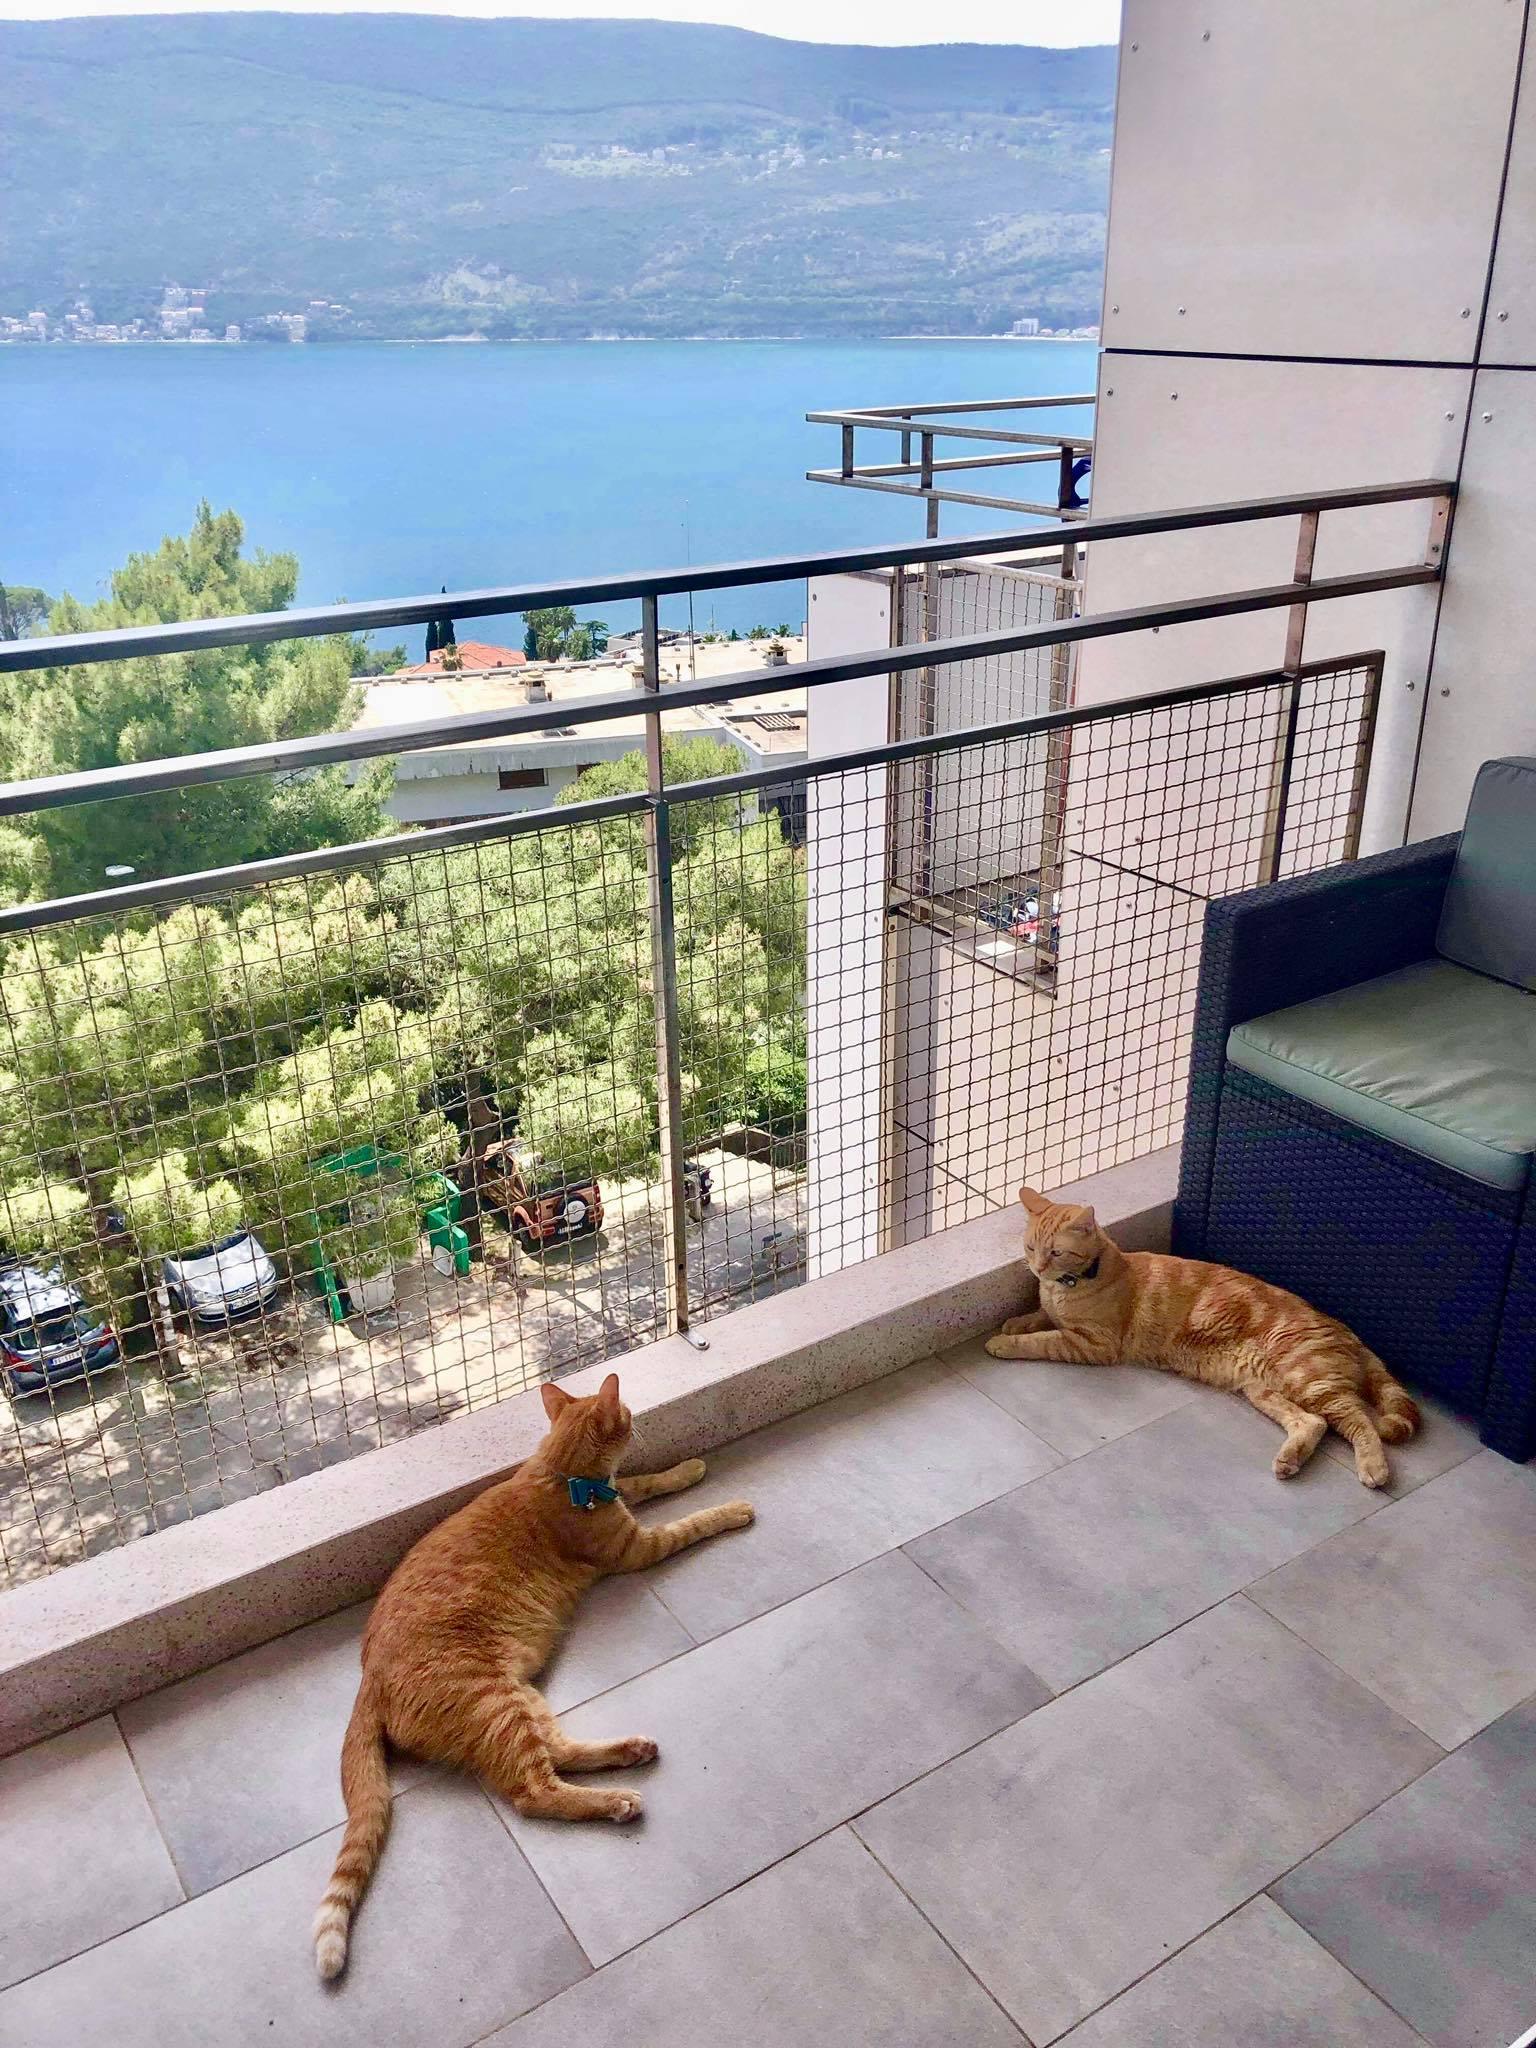 Expat Life in Montenegro Day 27 Captain Ahab & Little Zissou in Montenegro2.jpg